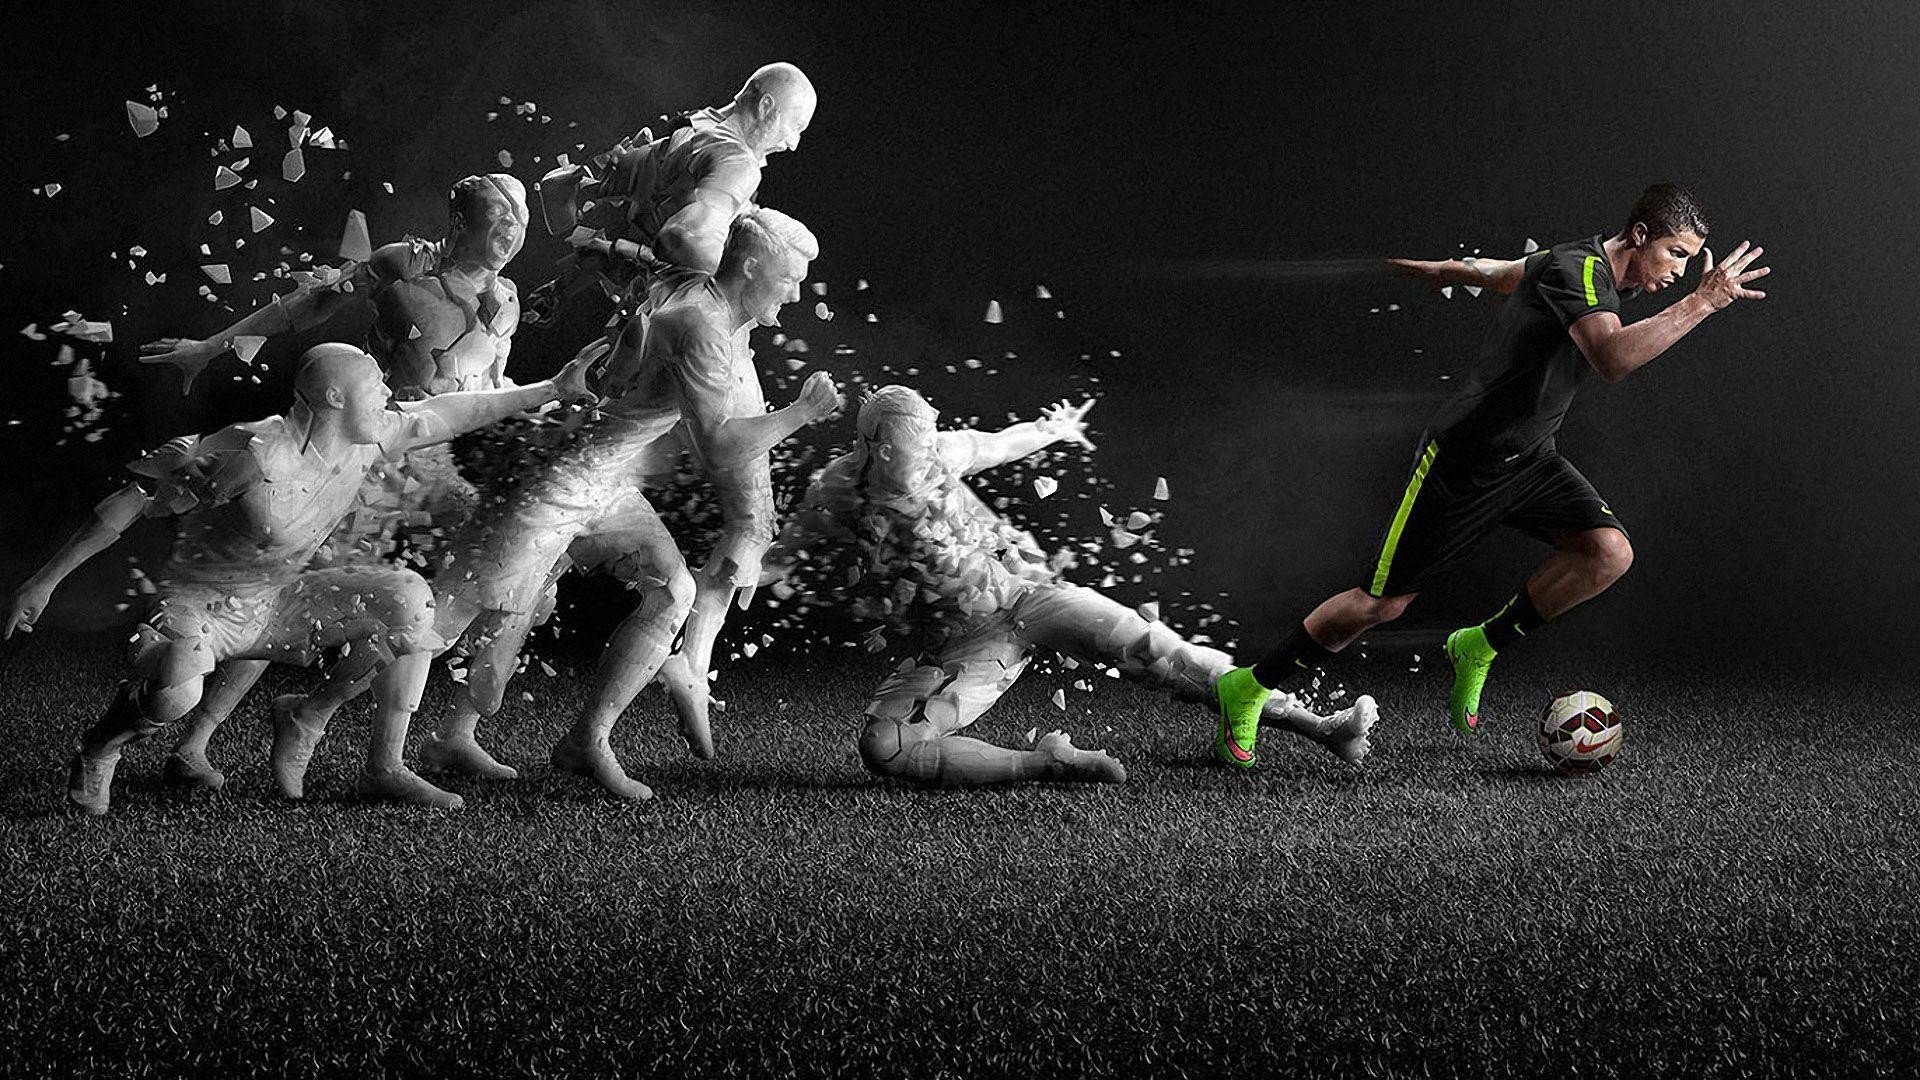 Nike Soccer Wallpaper 2018 Wallpapertag